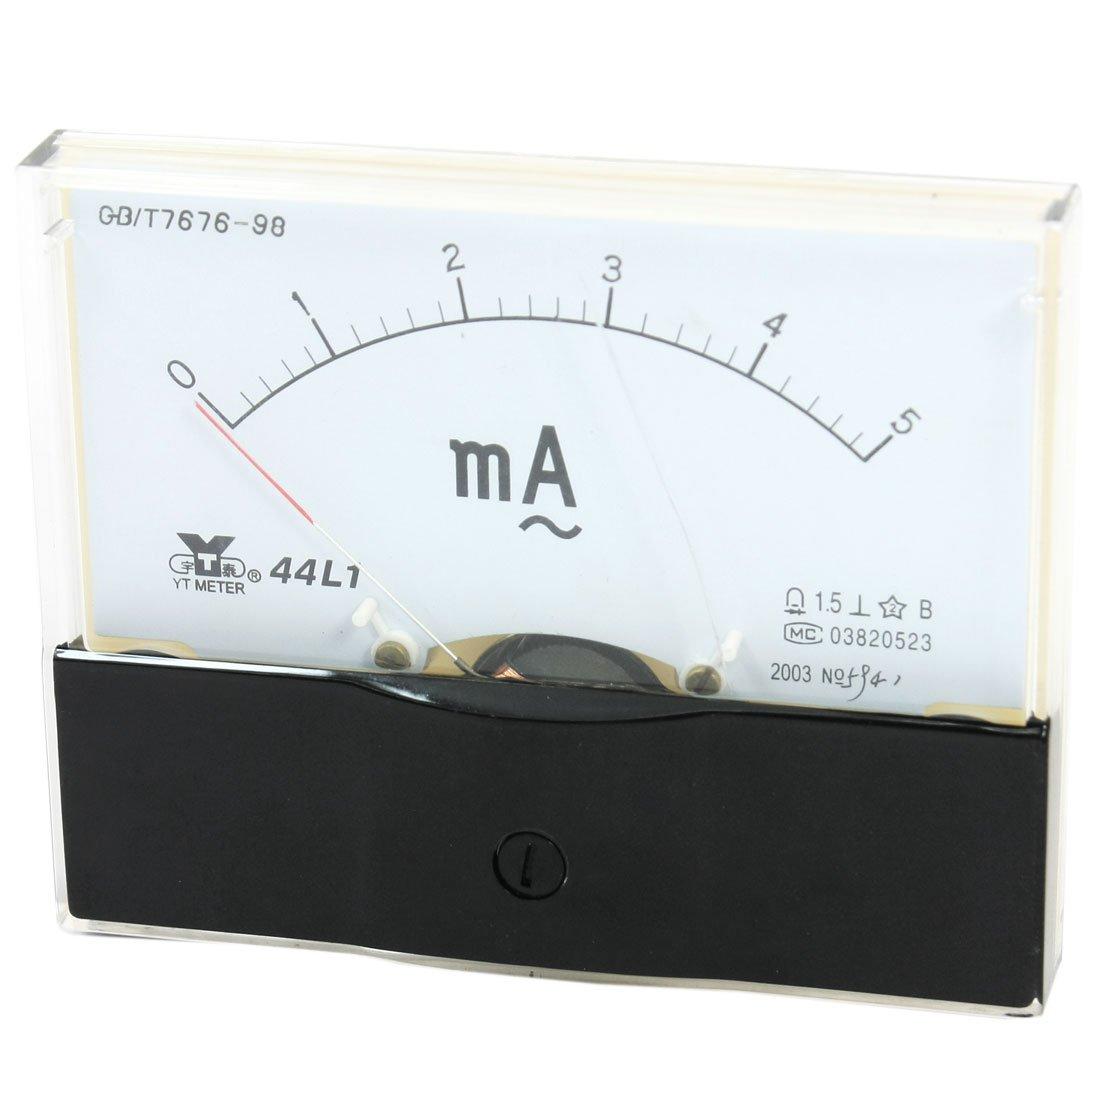 uxcell Measurement Tool Analog Ammeter Gauge AC 0-5mA Measuring Range 44L1